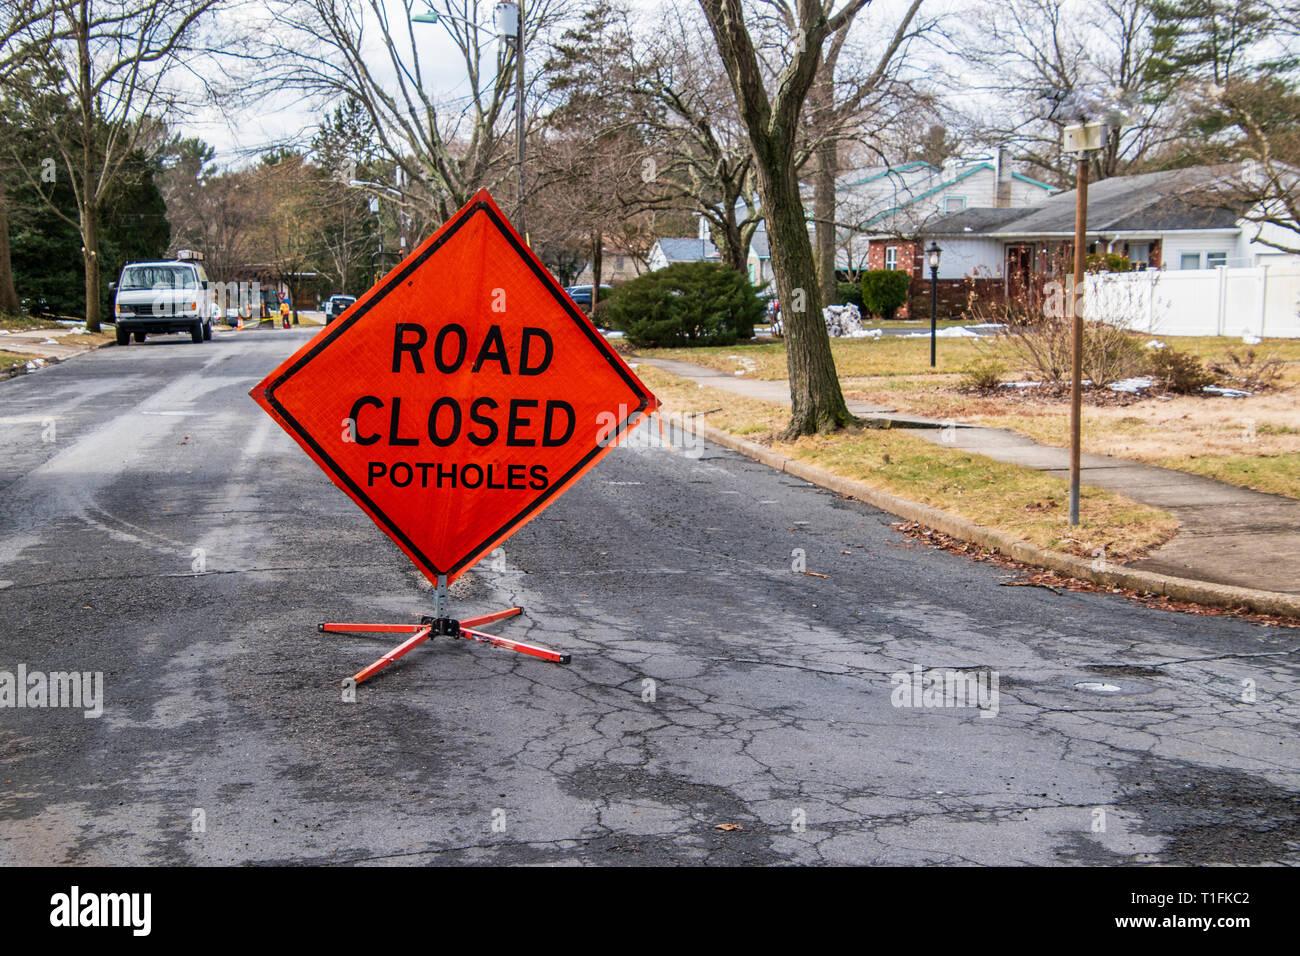 Orange triangular road sign on a small suburban street that says Road Closed Potholes - Stock Image